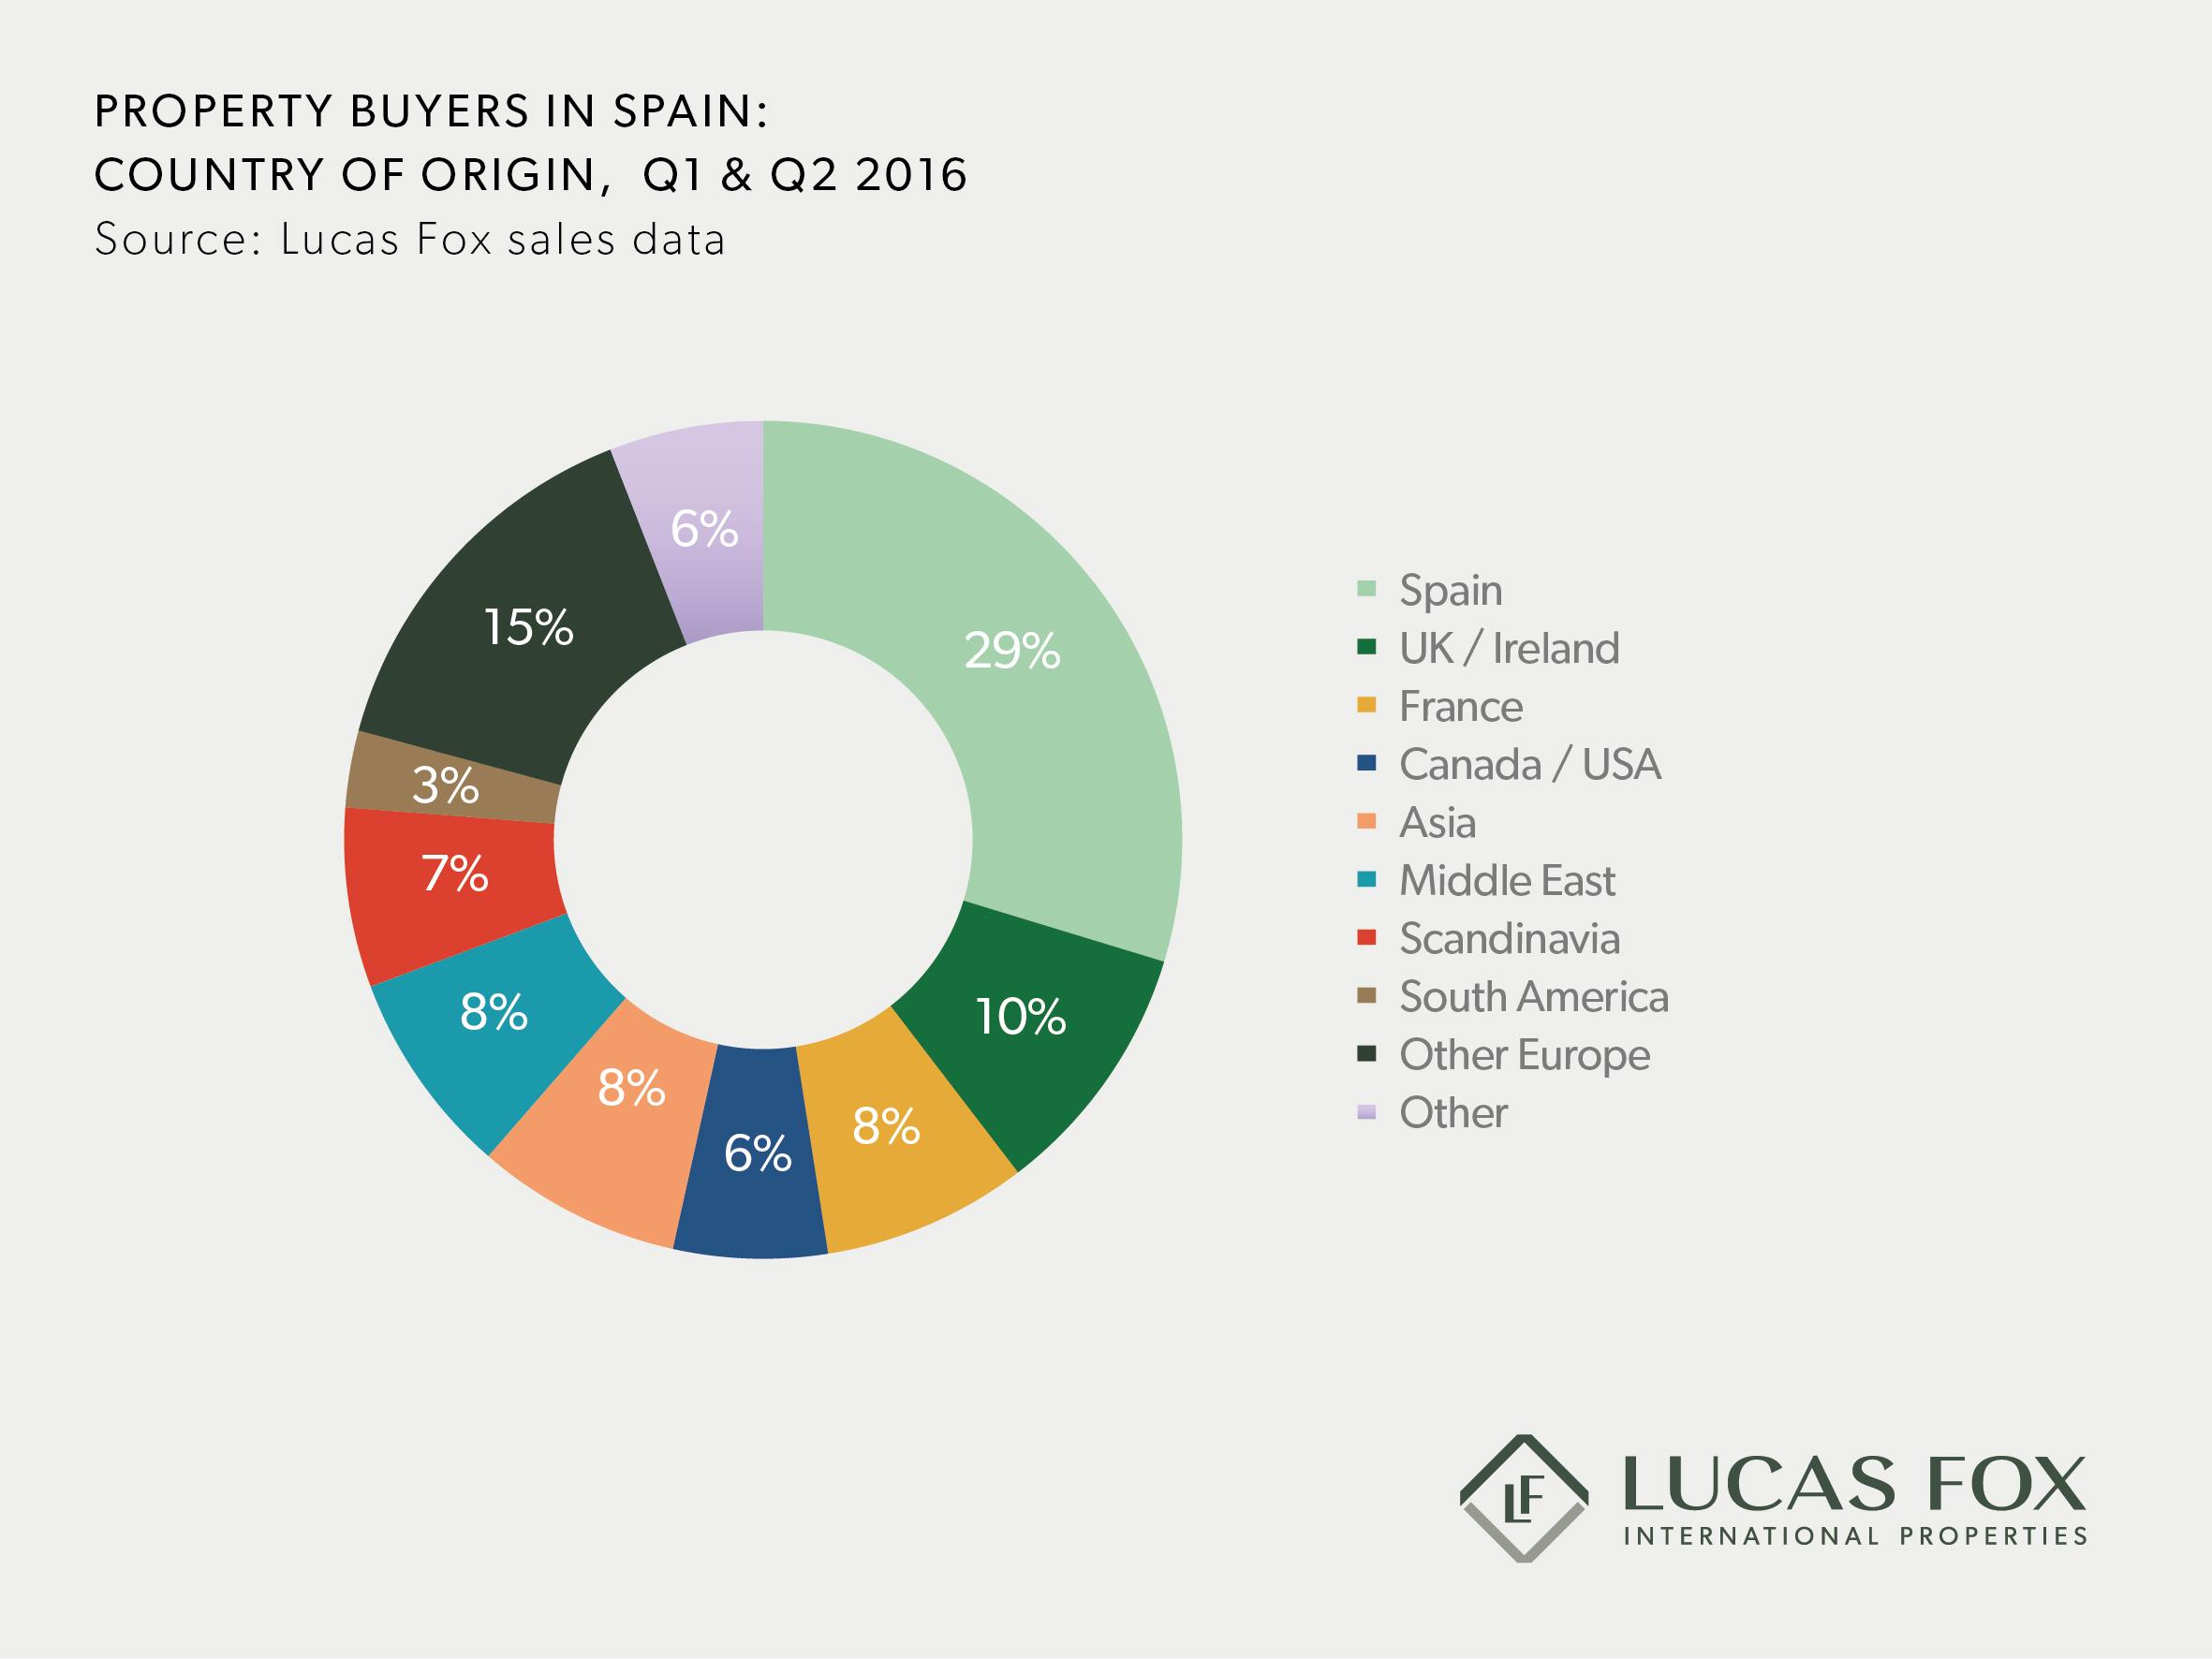 lucas-fox-buyers-country-of-origin-q1-q2-2016